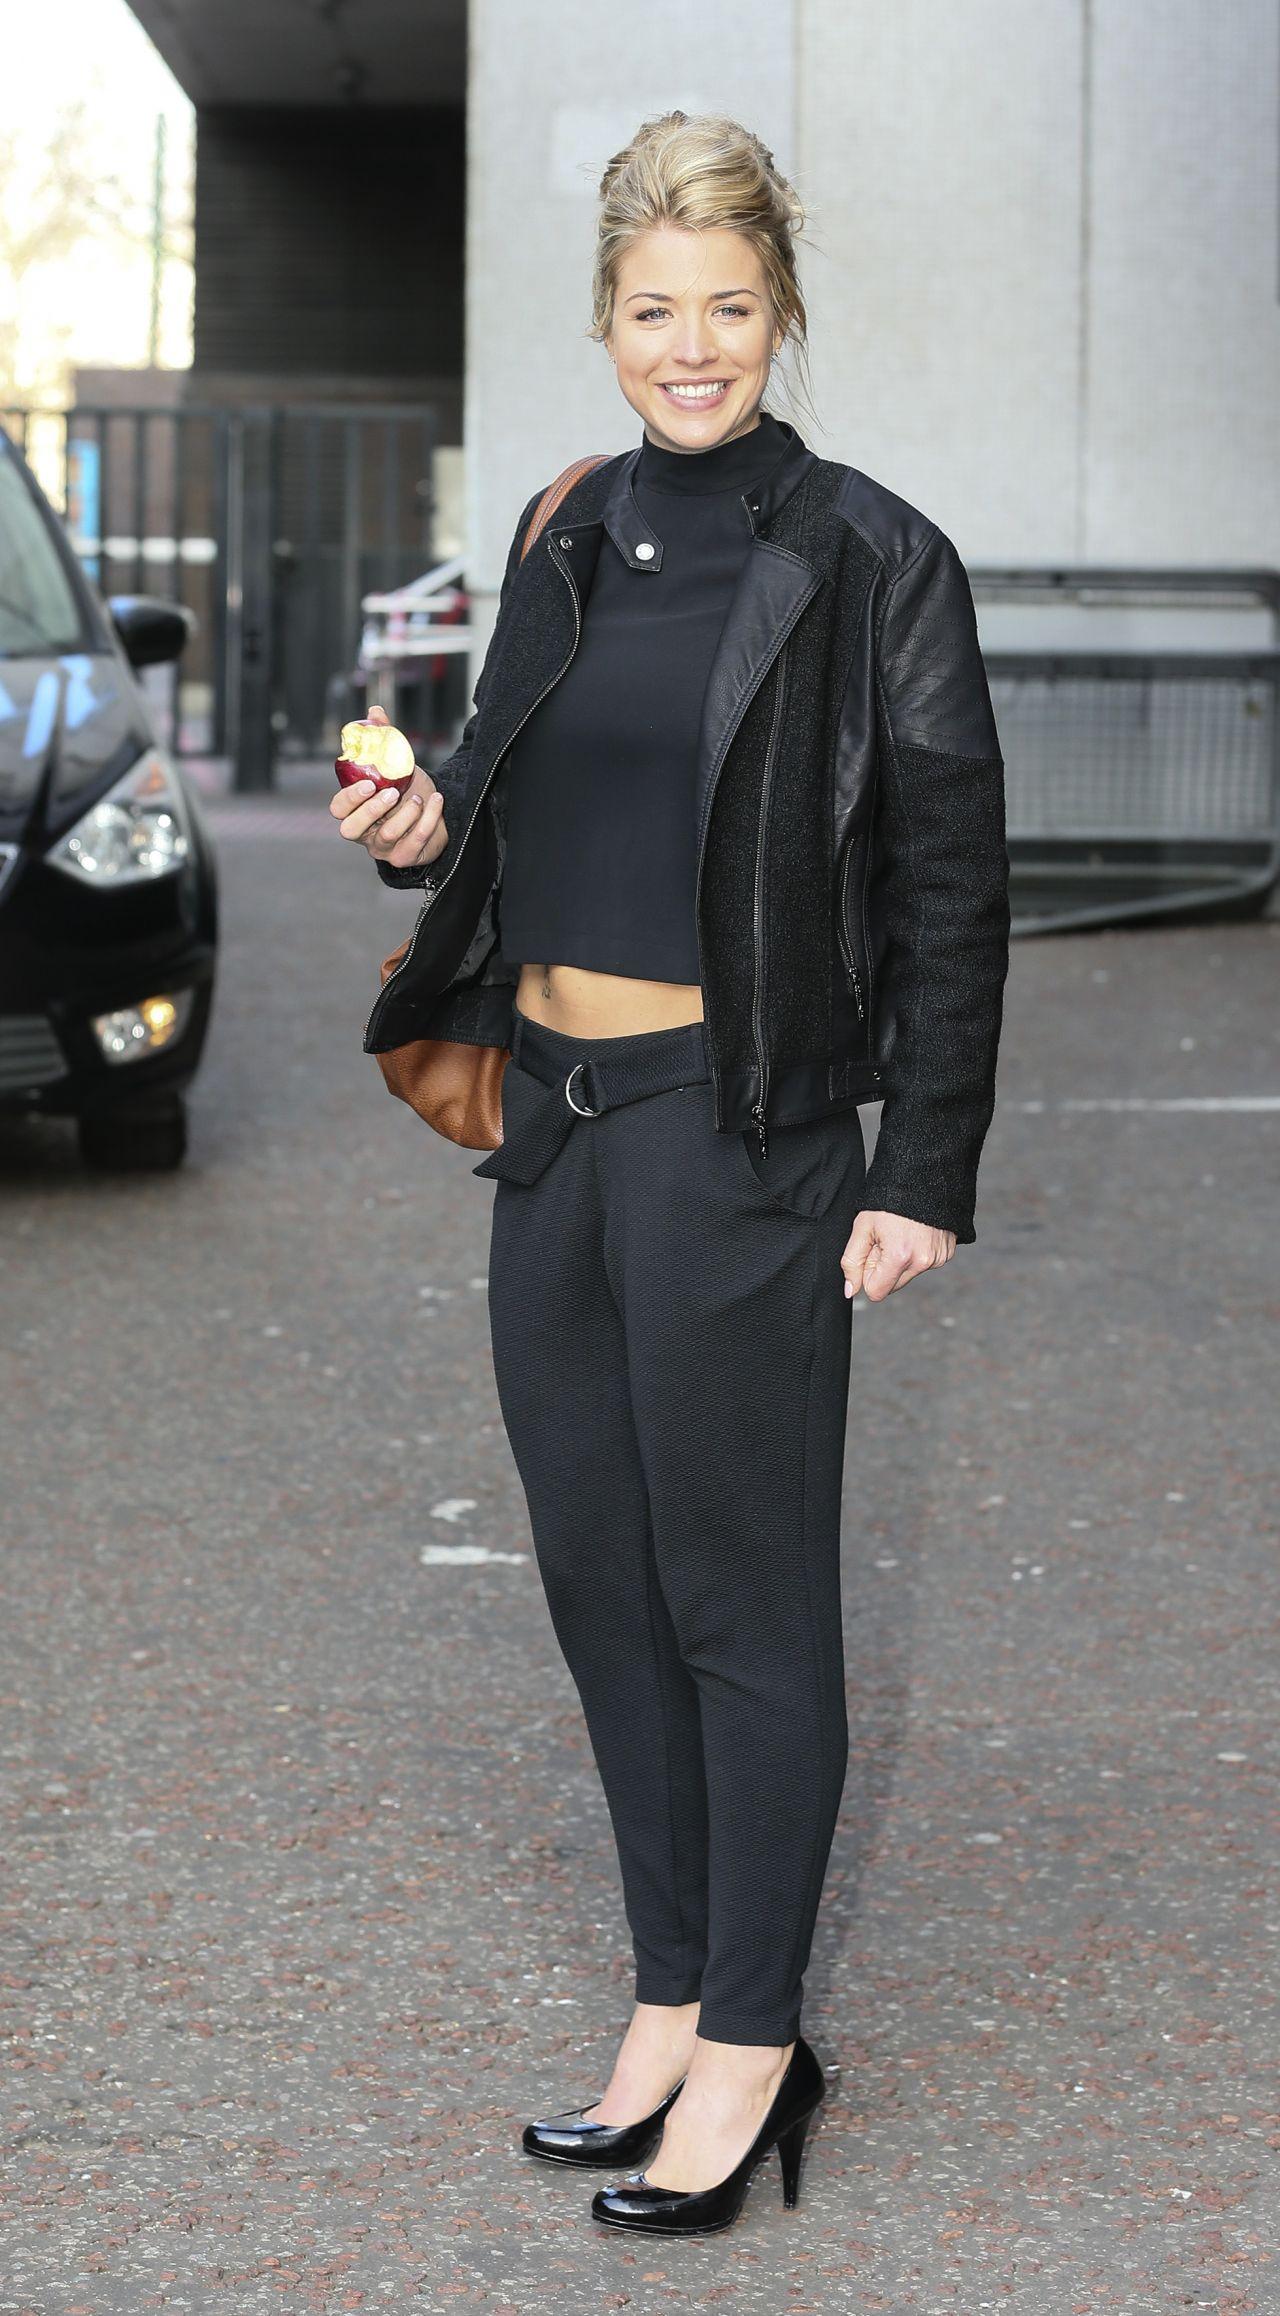 Gemma atkinson street style london naked (62 photos), Bikini Celebrity pics